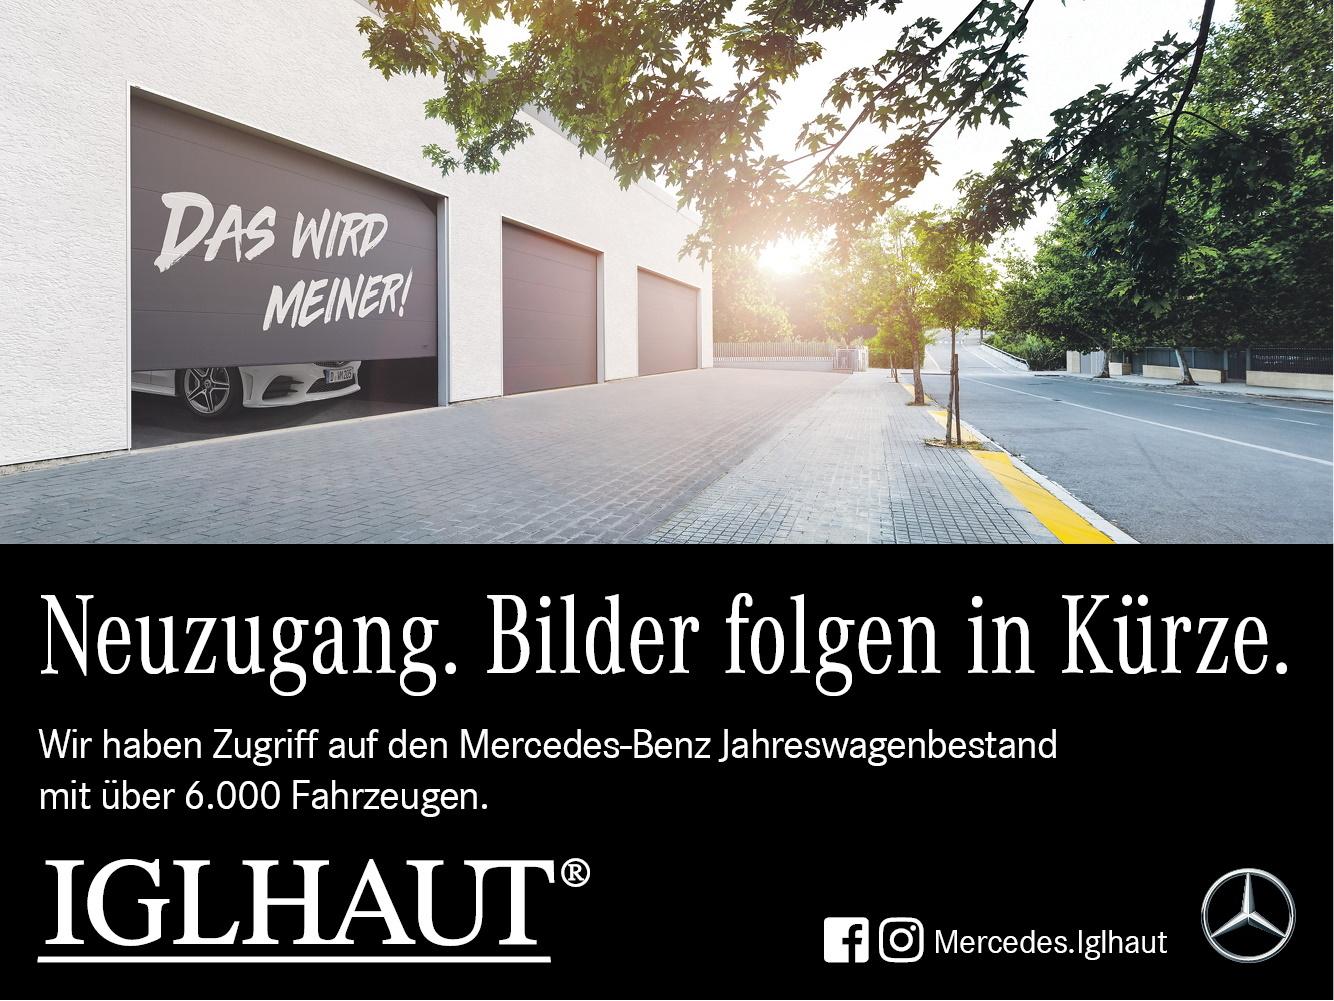 Mercedes-Benz B 200 CDI BE NAVI TEMPOMAT PARKASSIST KLIMAAUTOM, Jahr 2014, Diesel